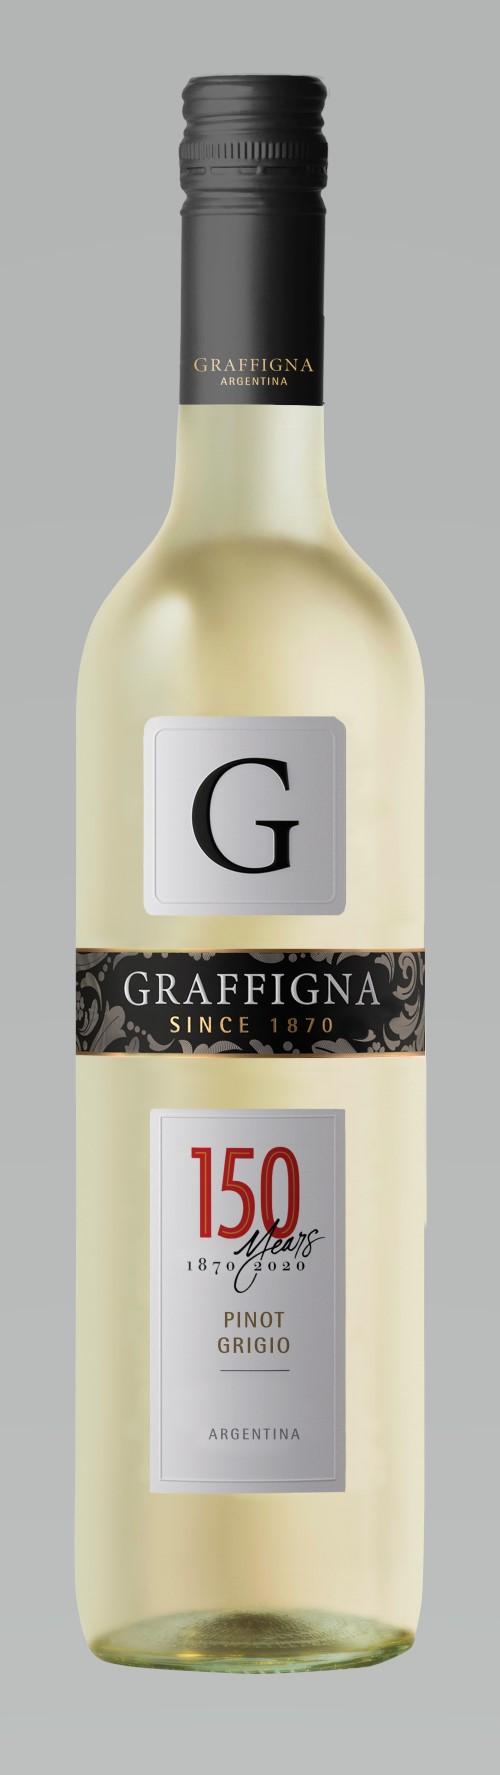 Pinot Grigio: Graffigna